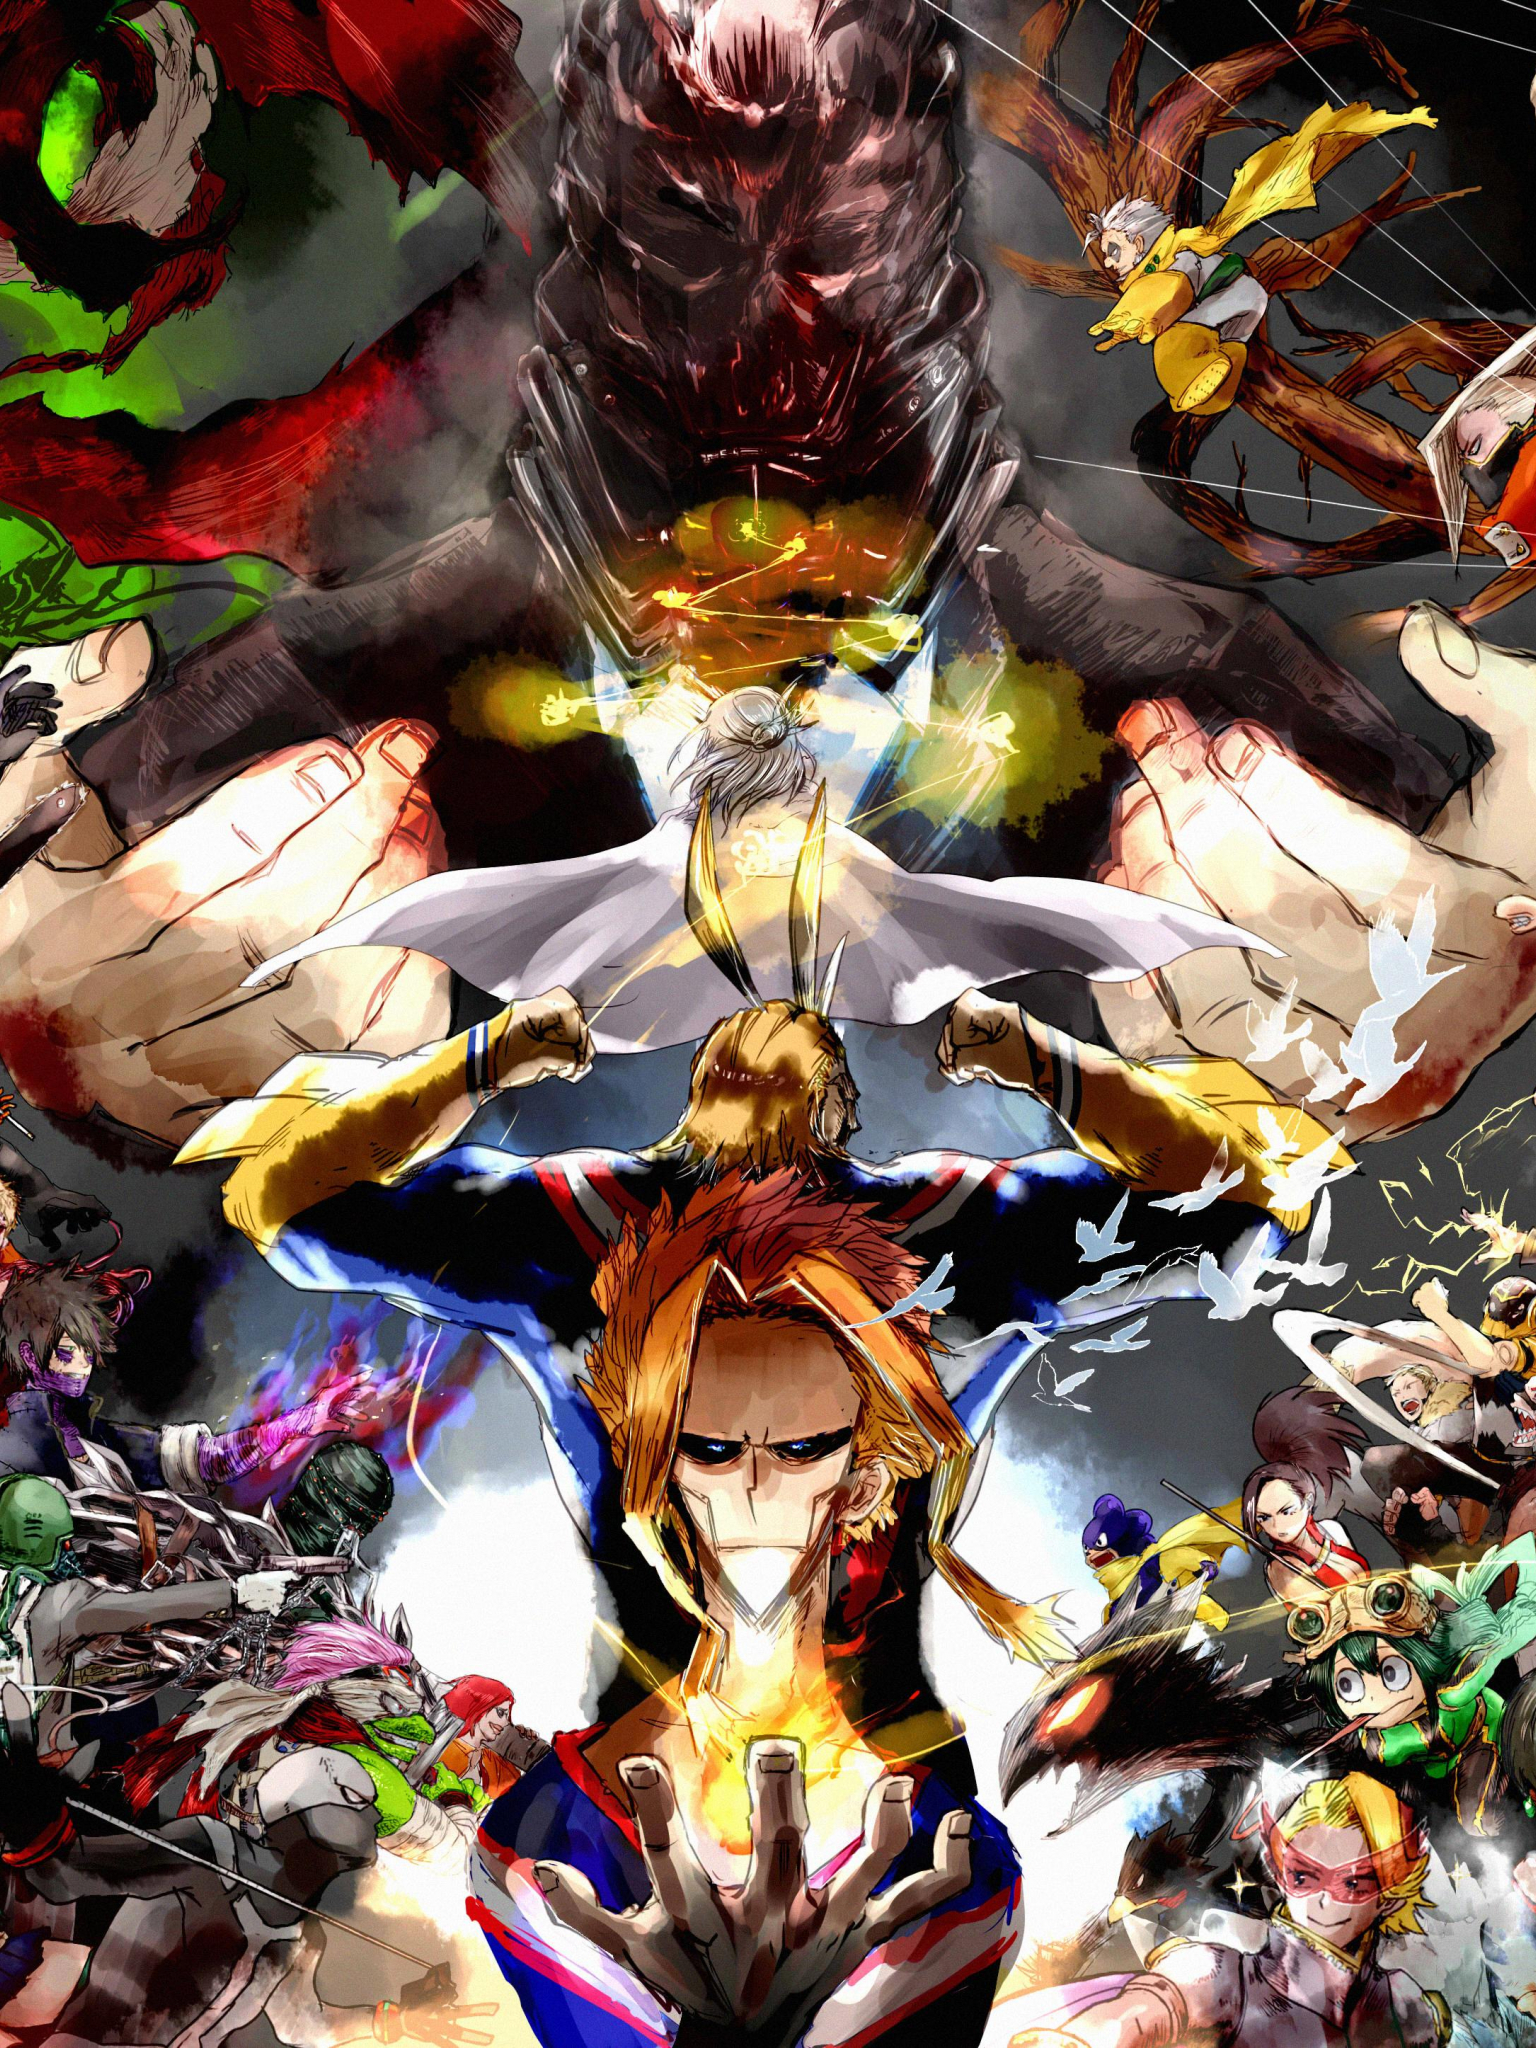 Free Download Boku No Hero Academia 4k Wallpaper Album On Imgur